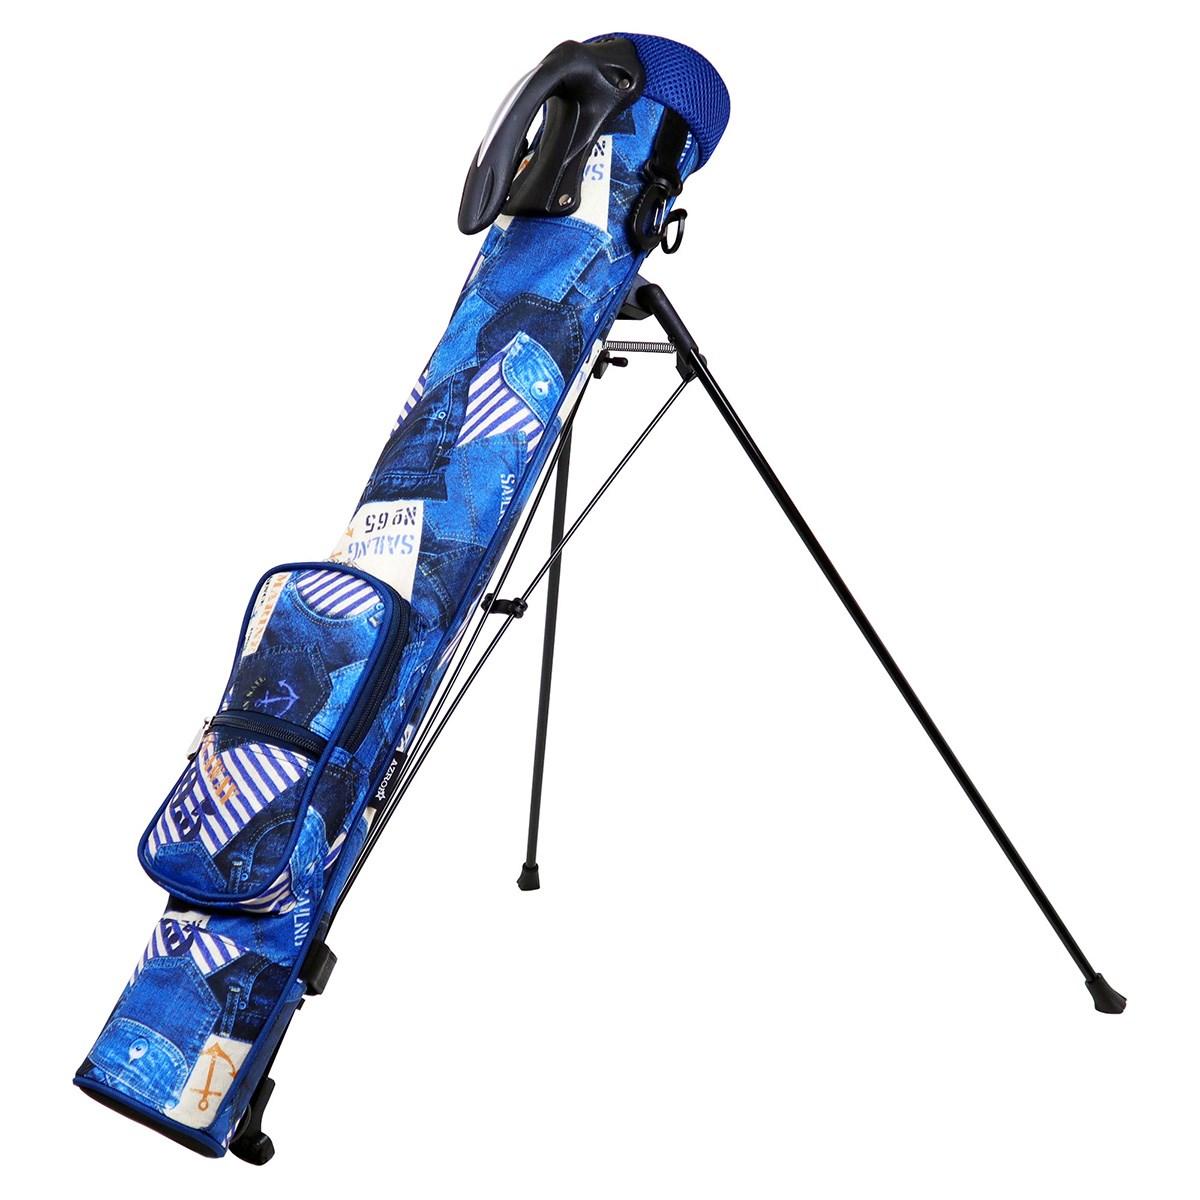 AZROF アズロフ スタンドクラブケース セーリングブルー セーリングブルー